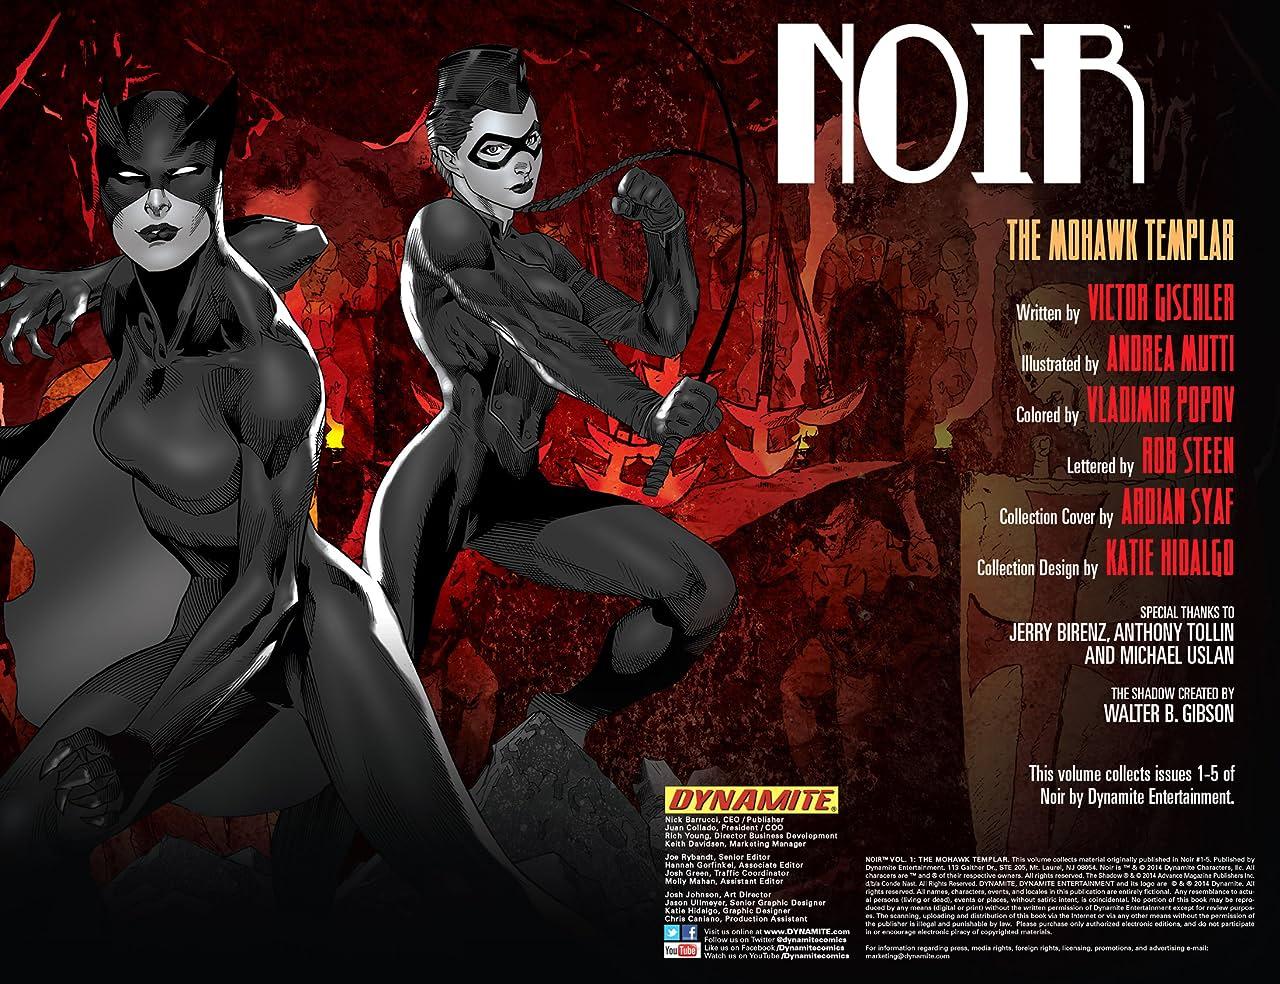 Noir Vol. 1